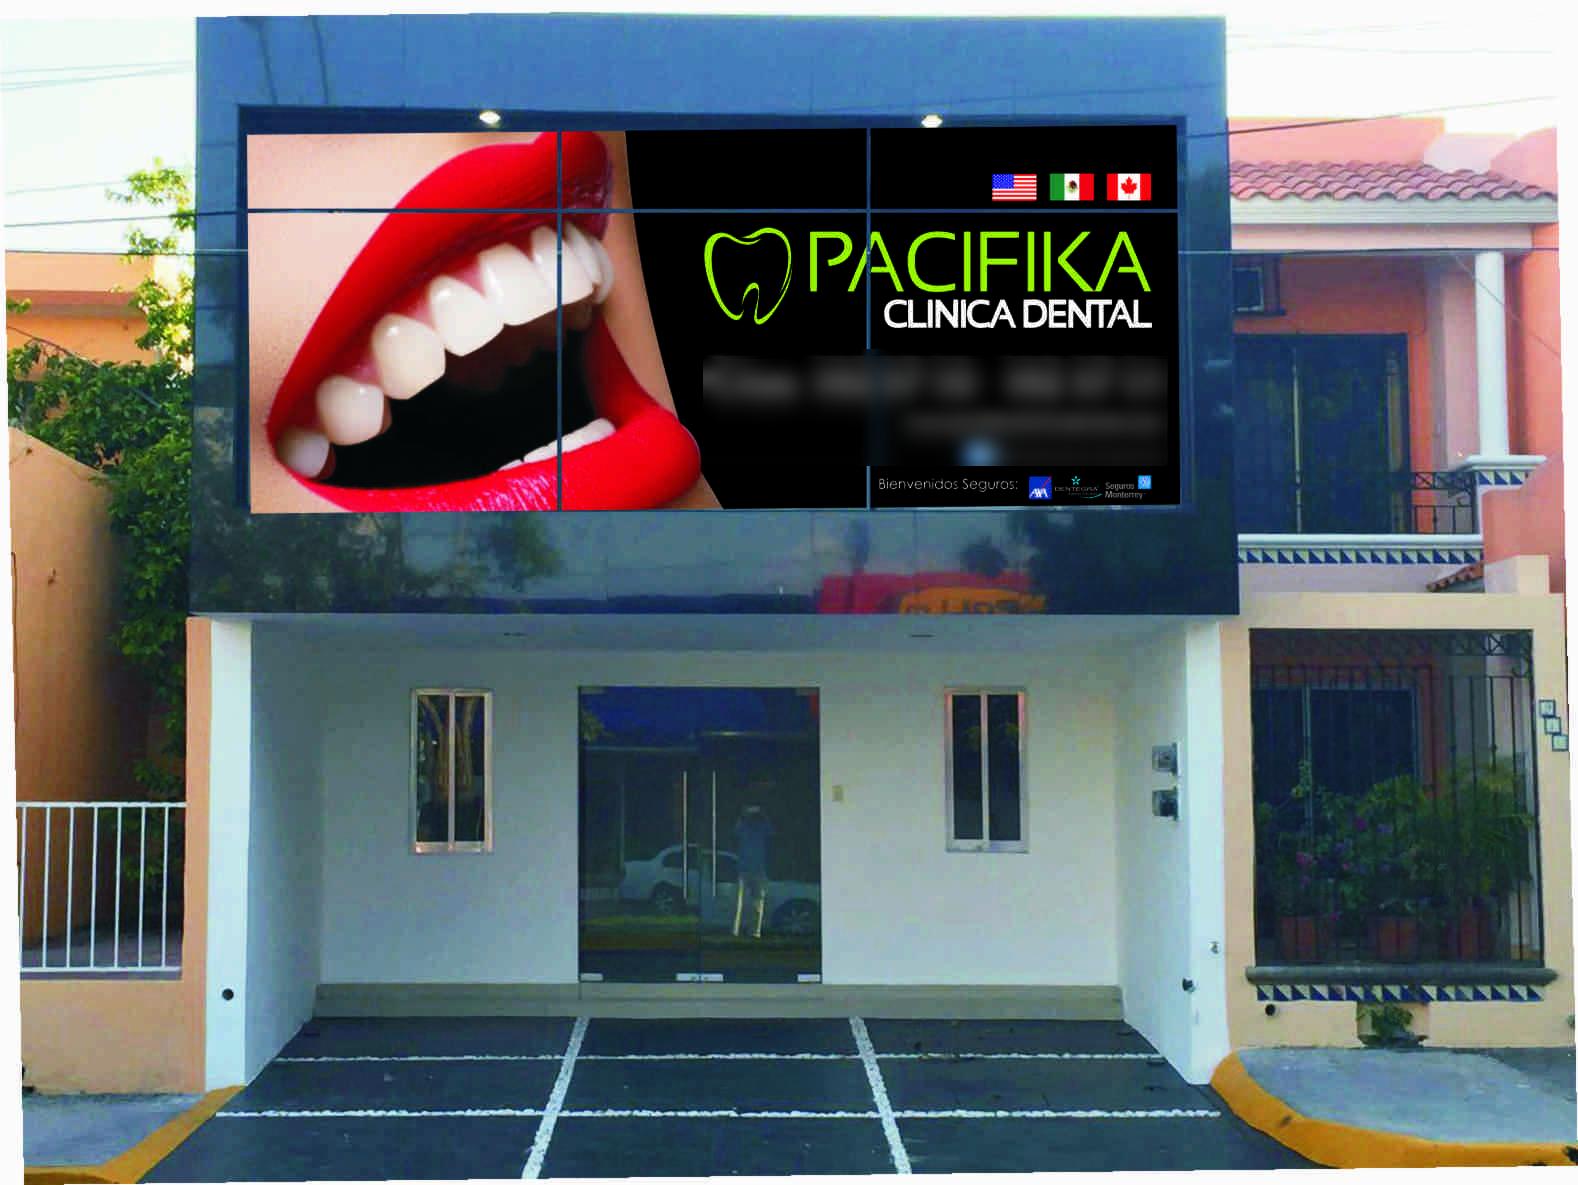 Pacifika Clinica Dental